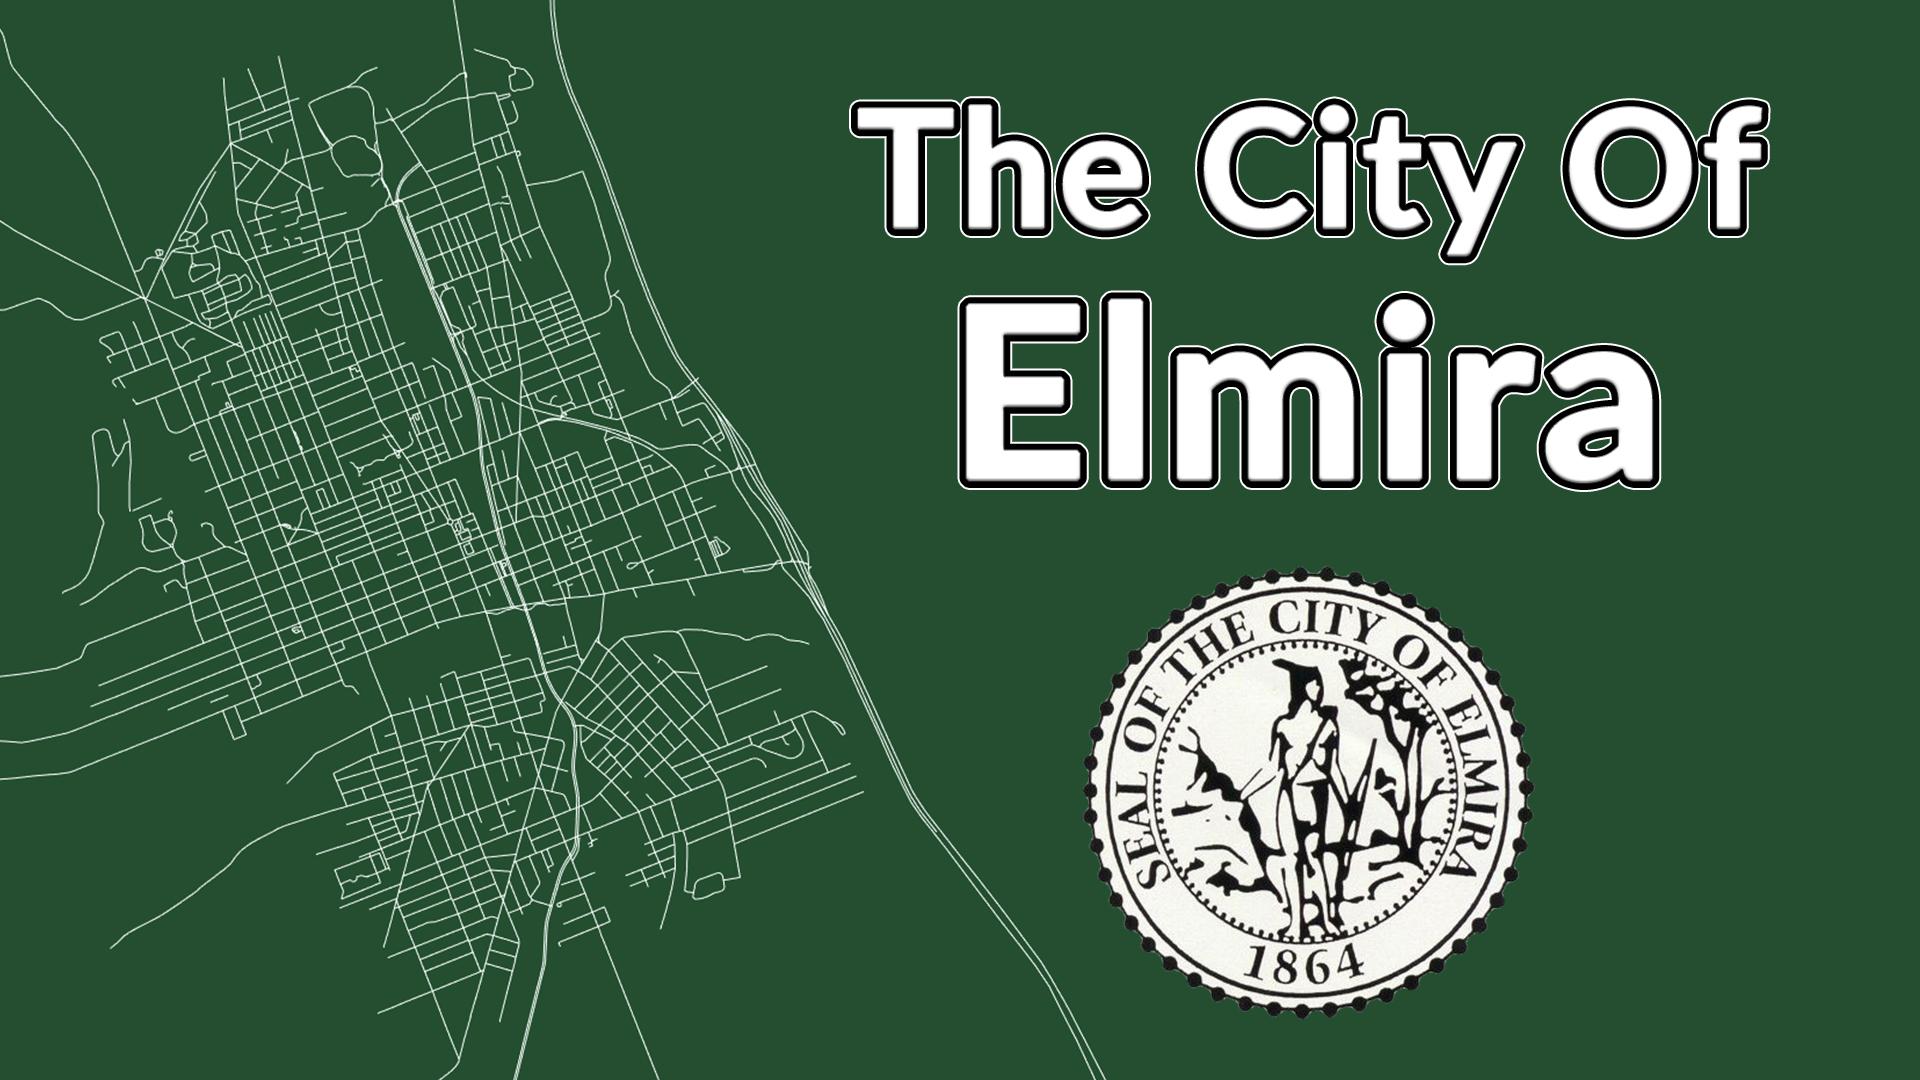 City of Elmira